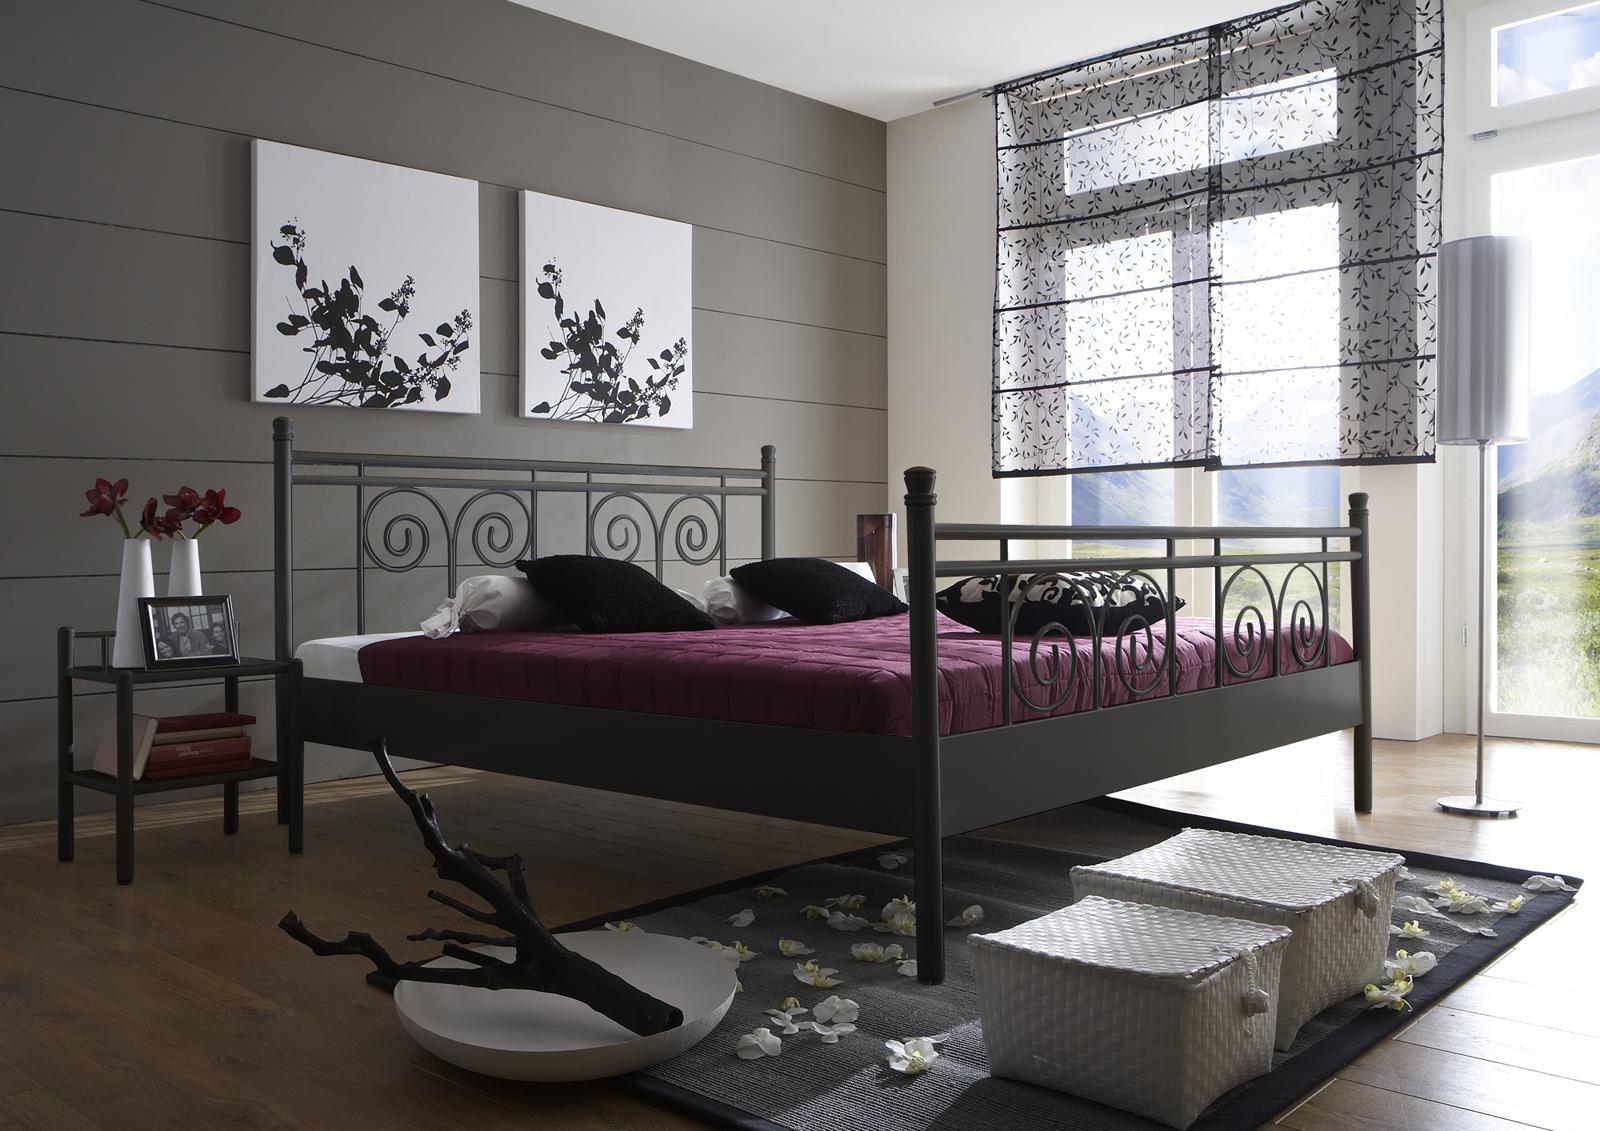 sam metallbett schwarz 180 x 200 cm rhodos g nstig. Black Bedroom Furniture Sets. Home Design Ideas